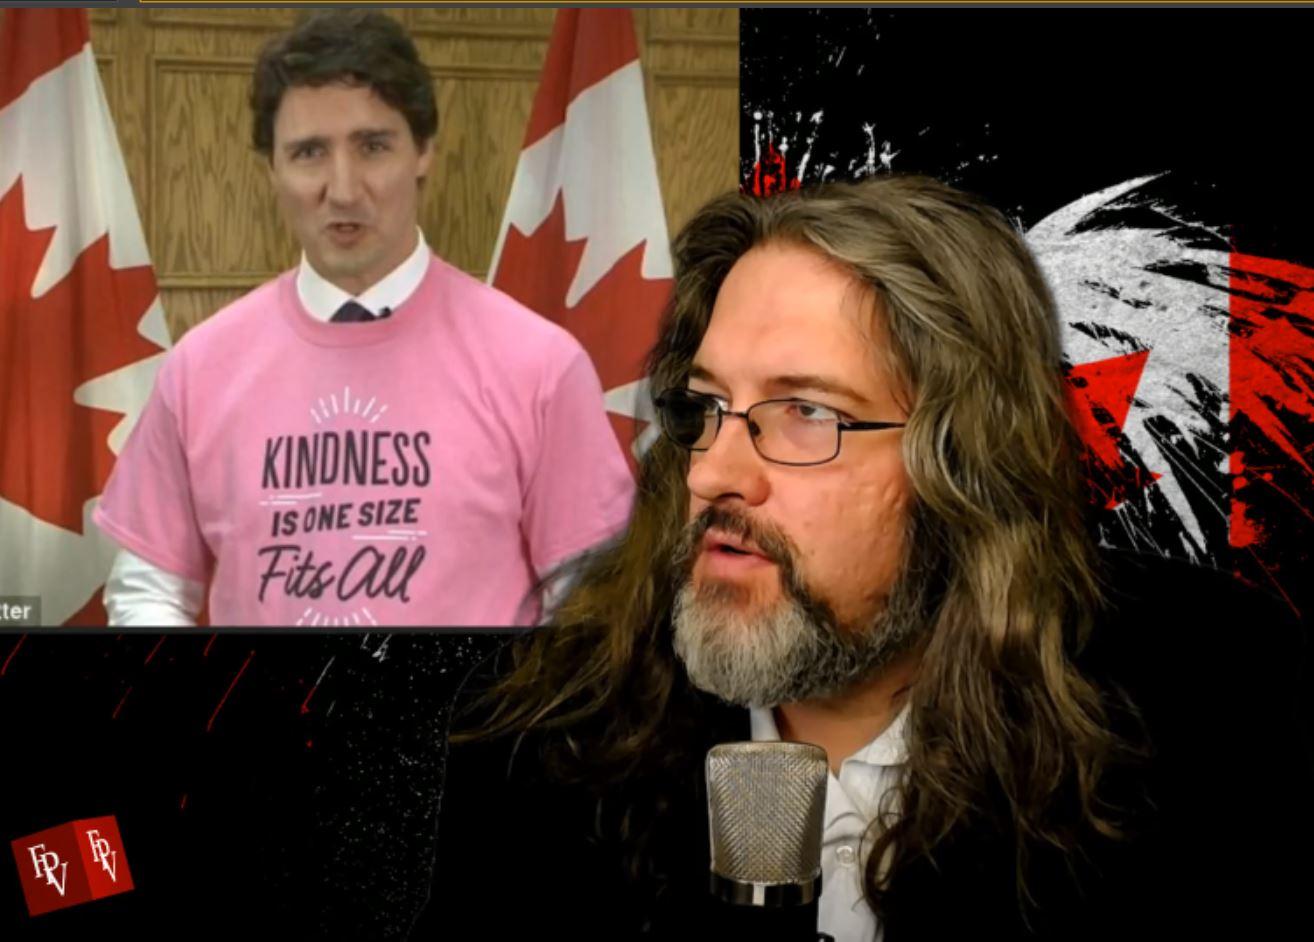 VIDEO: Metal And Polls, Bernier, Scheer, and Trudeau